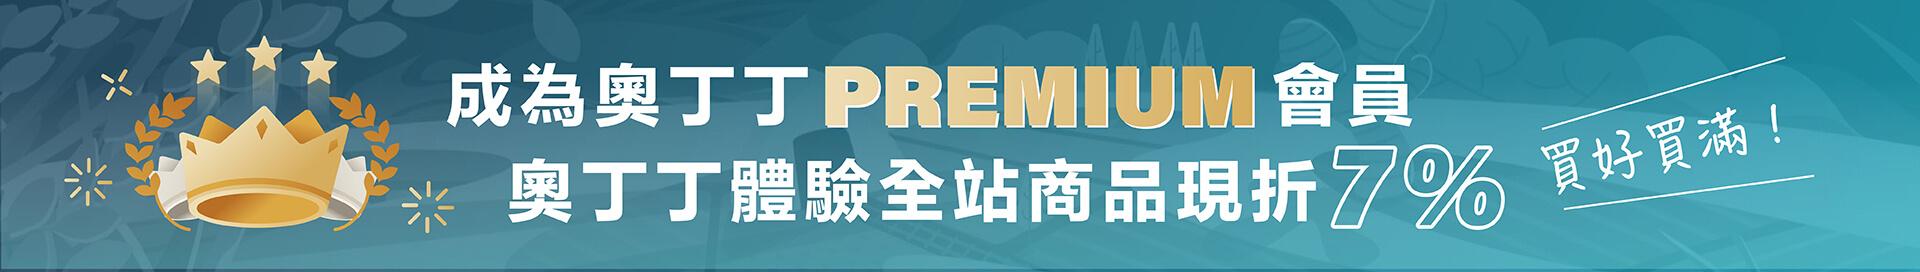 Premium 萬用banner